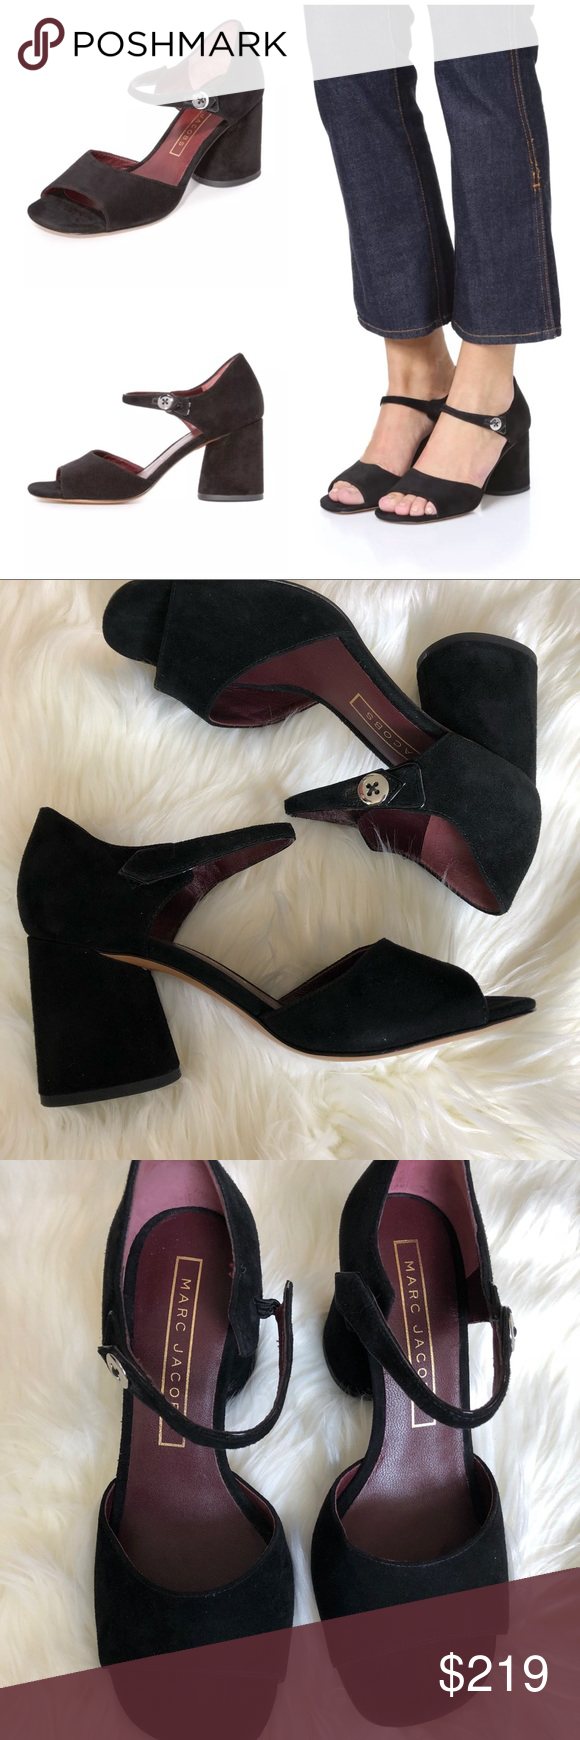 Block heels sandal, Marc jacobs shoes